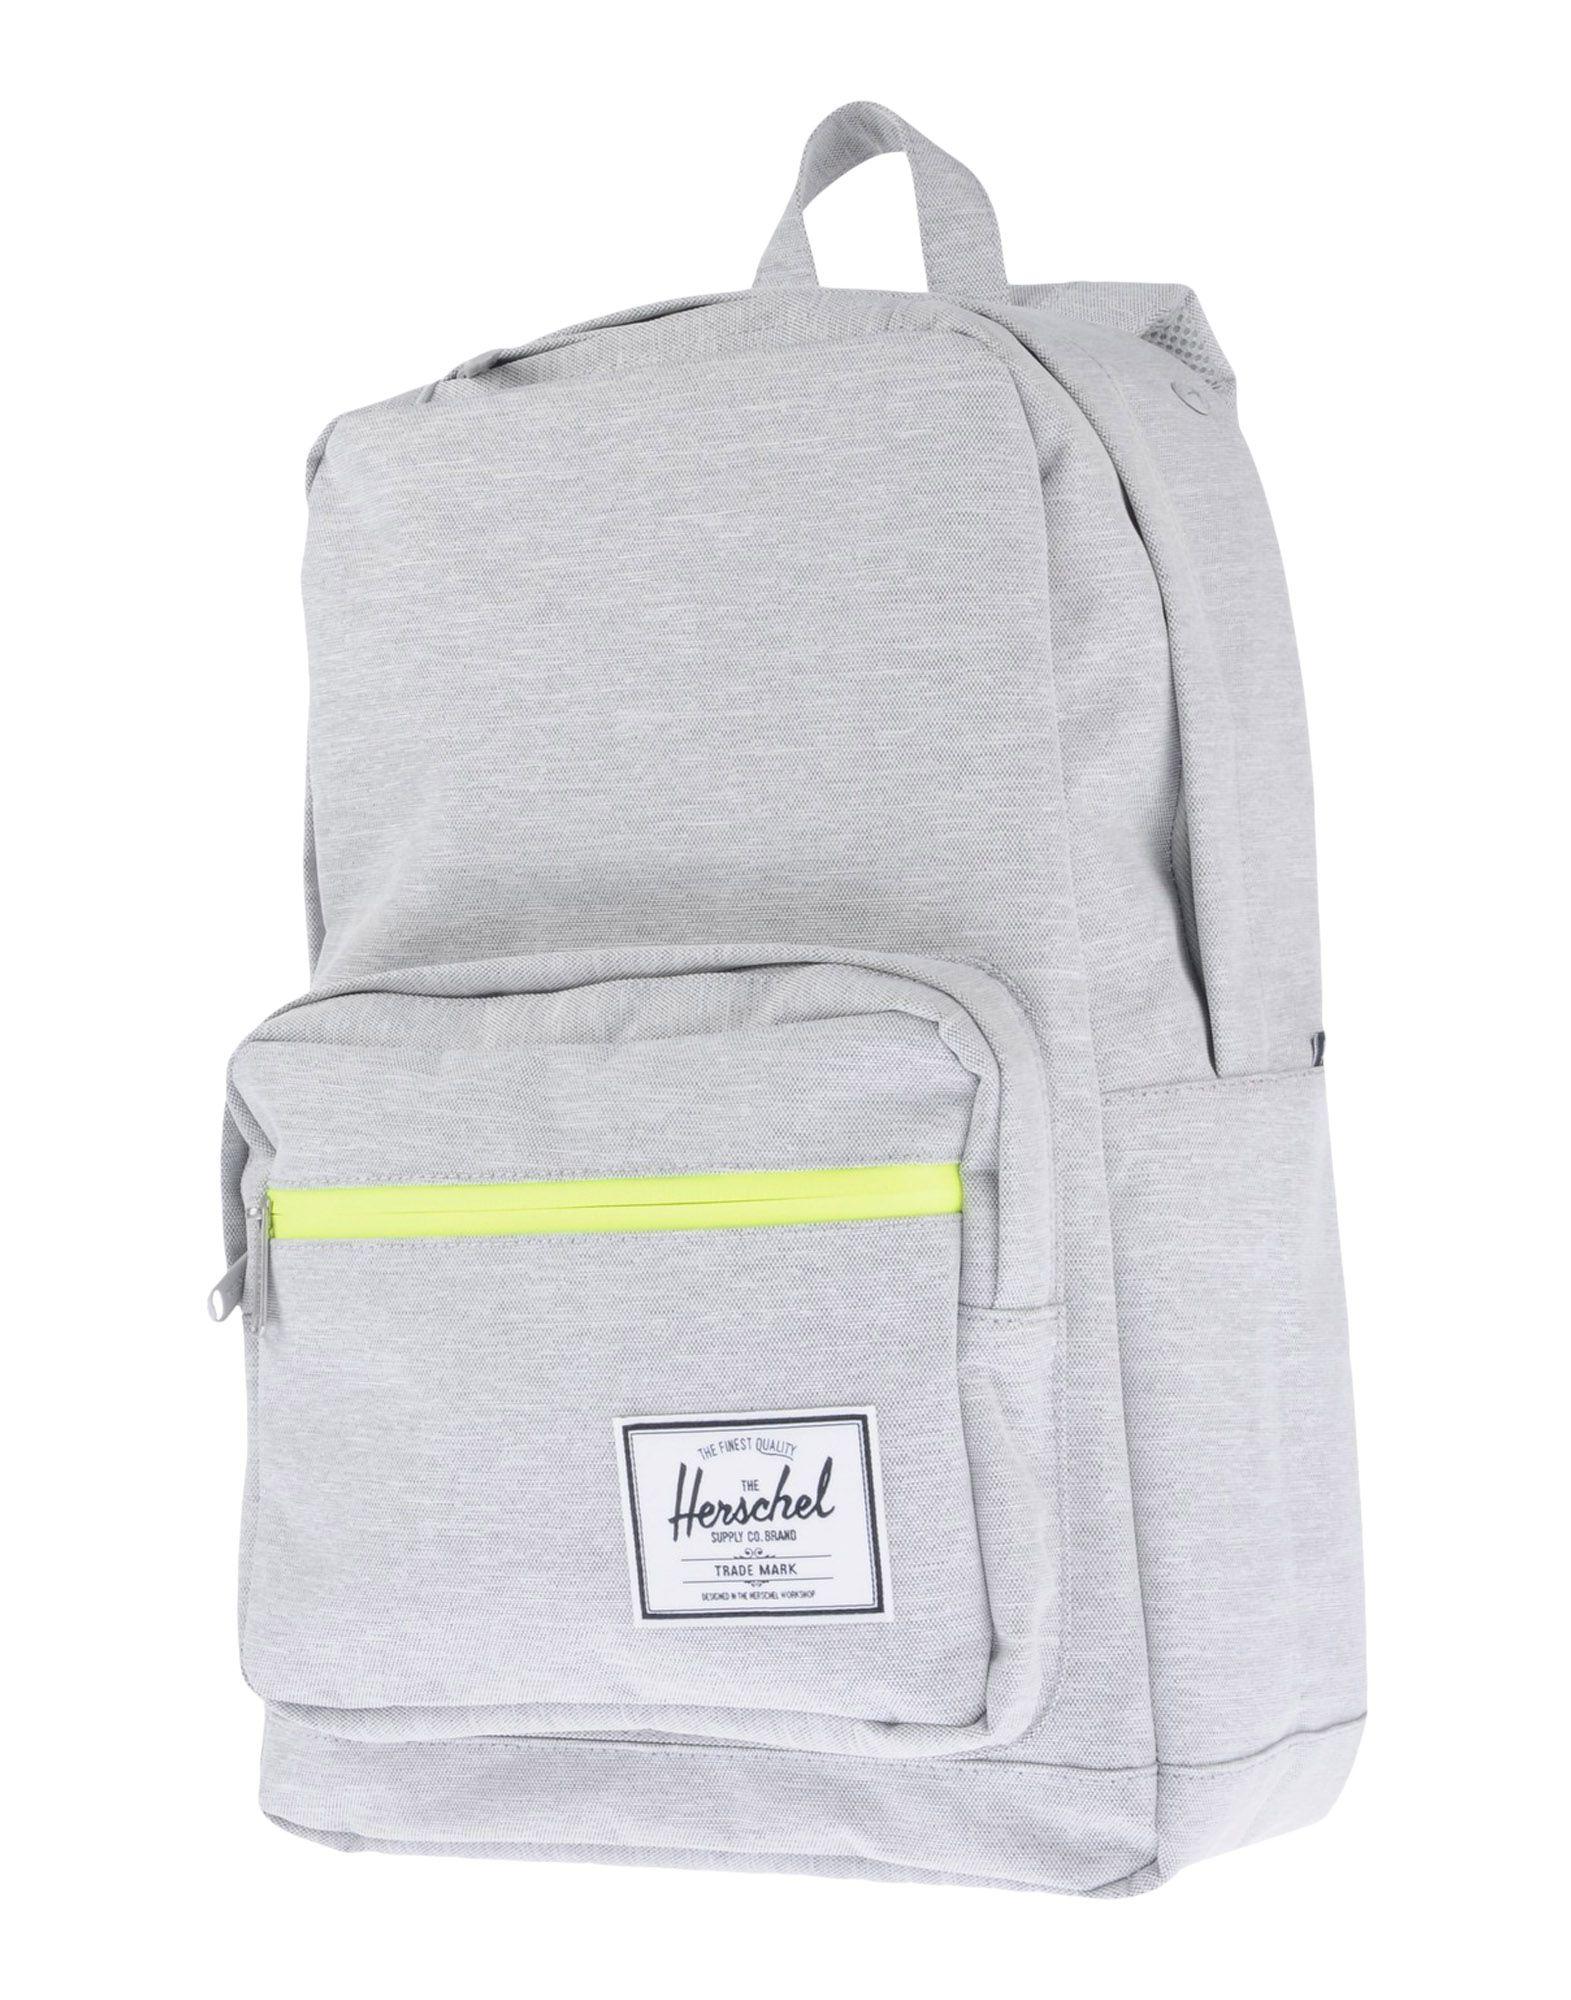 0d35d9e50bb Herschel Supply Co. Backpack   Fanny Pack In Light Grey